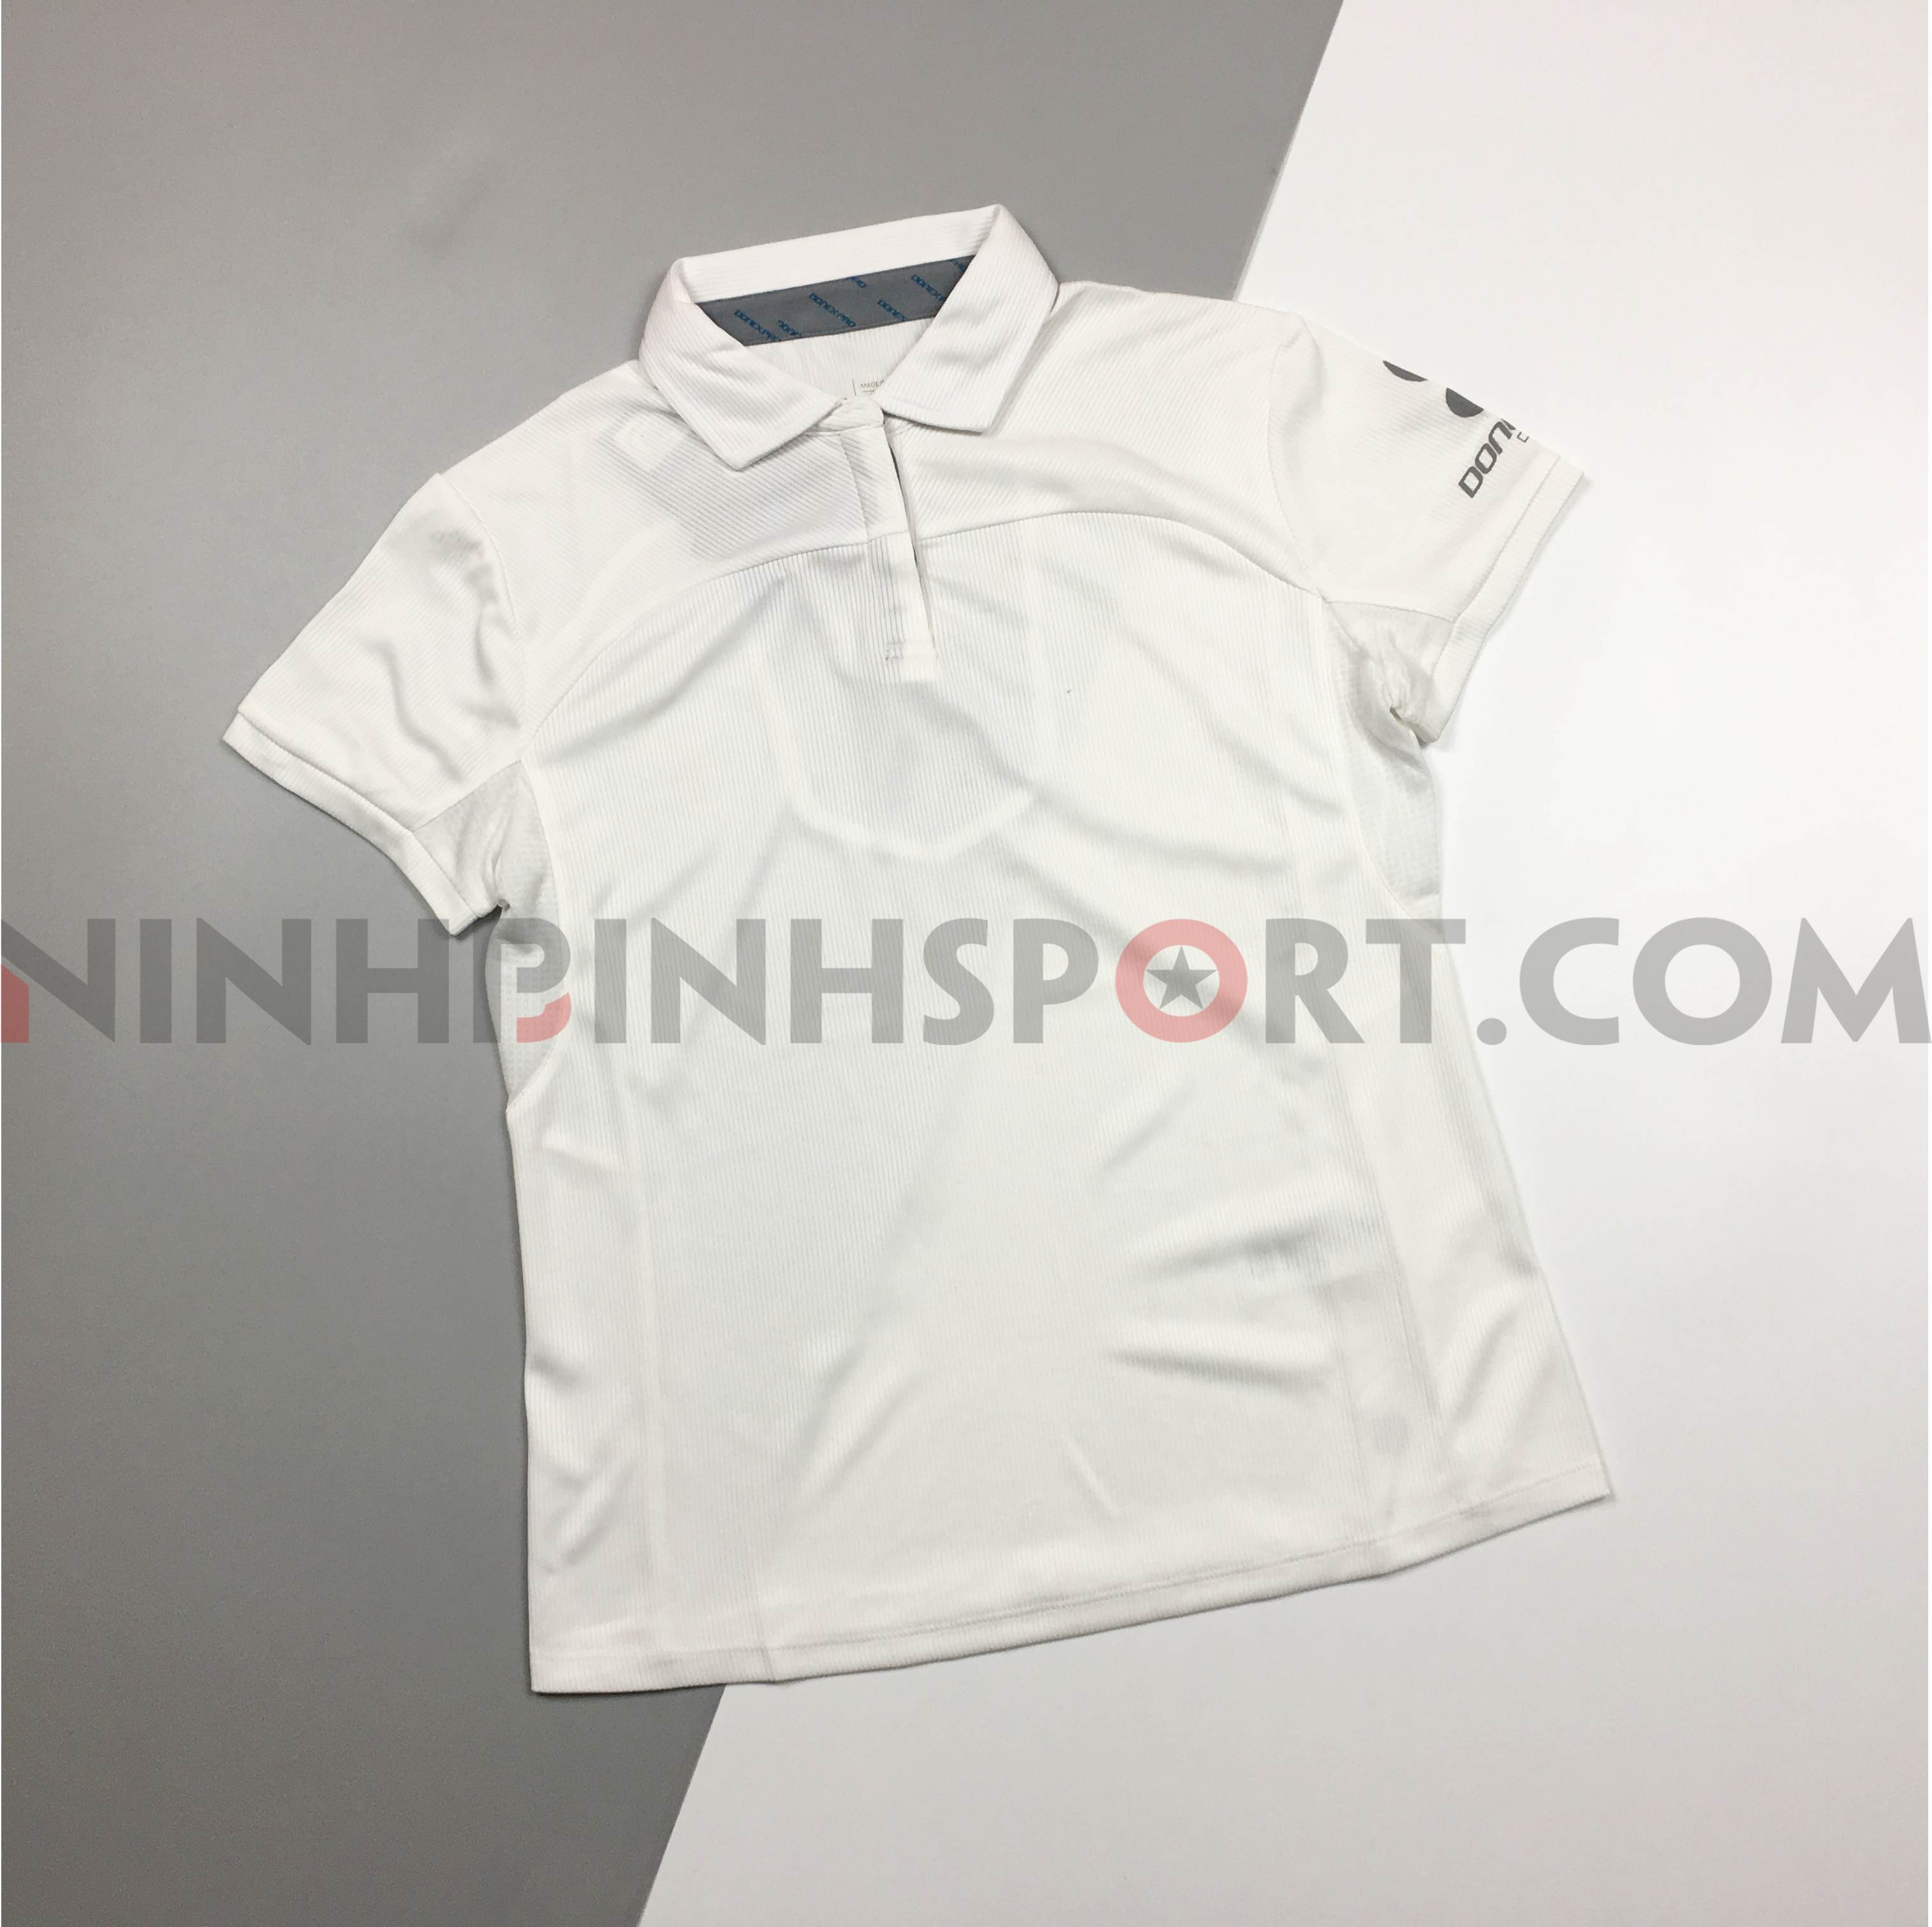 Áo thể thao nữ Donex AC-3356-01-05